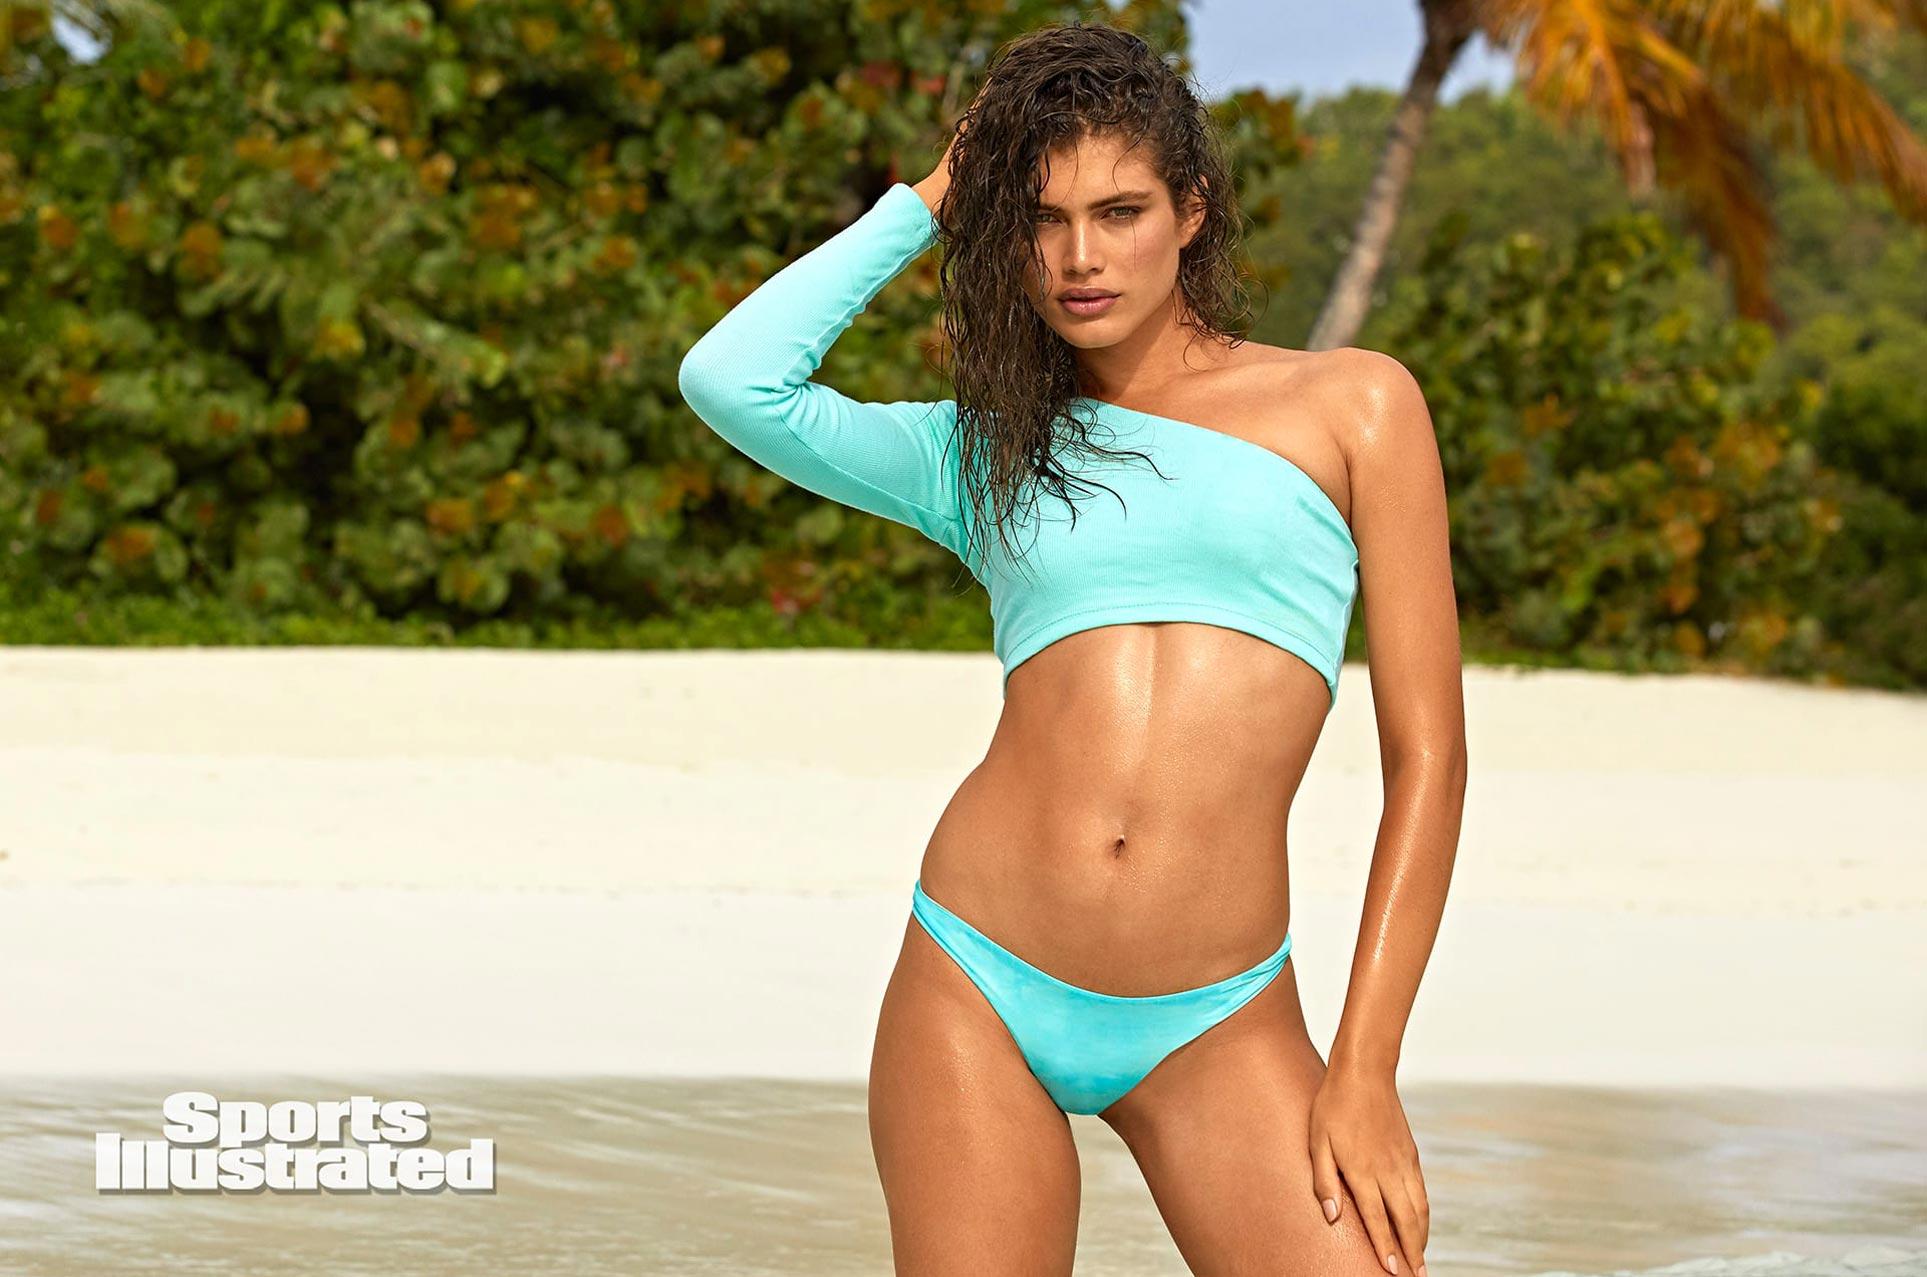 Валентина Сампайо в каталоге купальников Sports Illustrated Swimsuit 2020 / фото 14